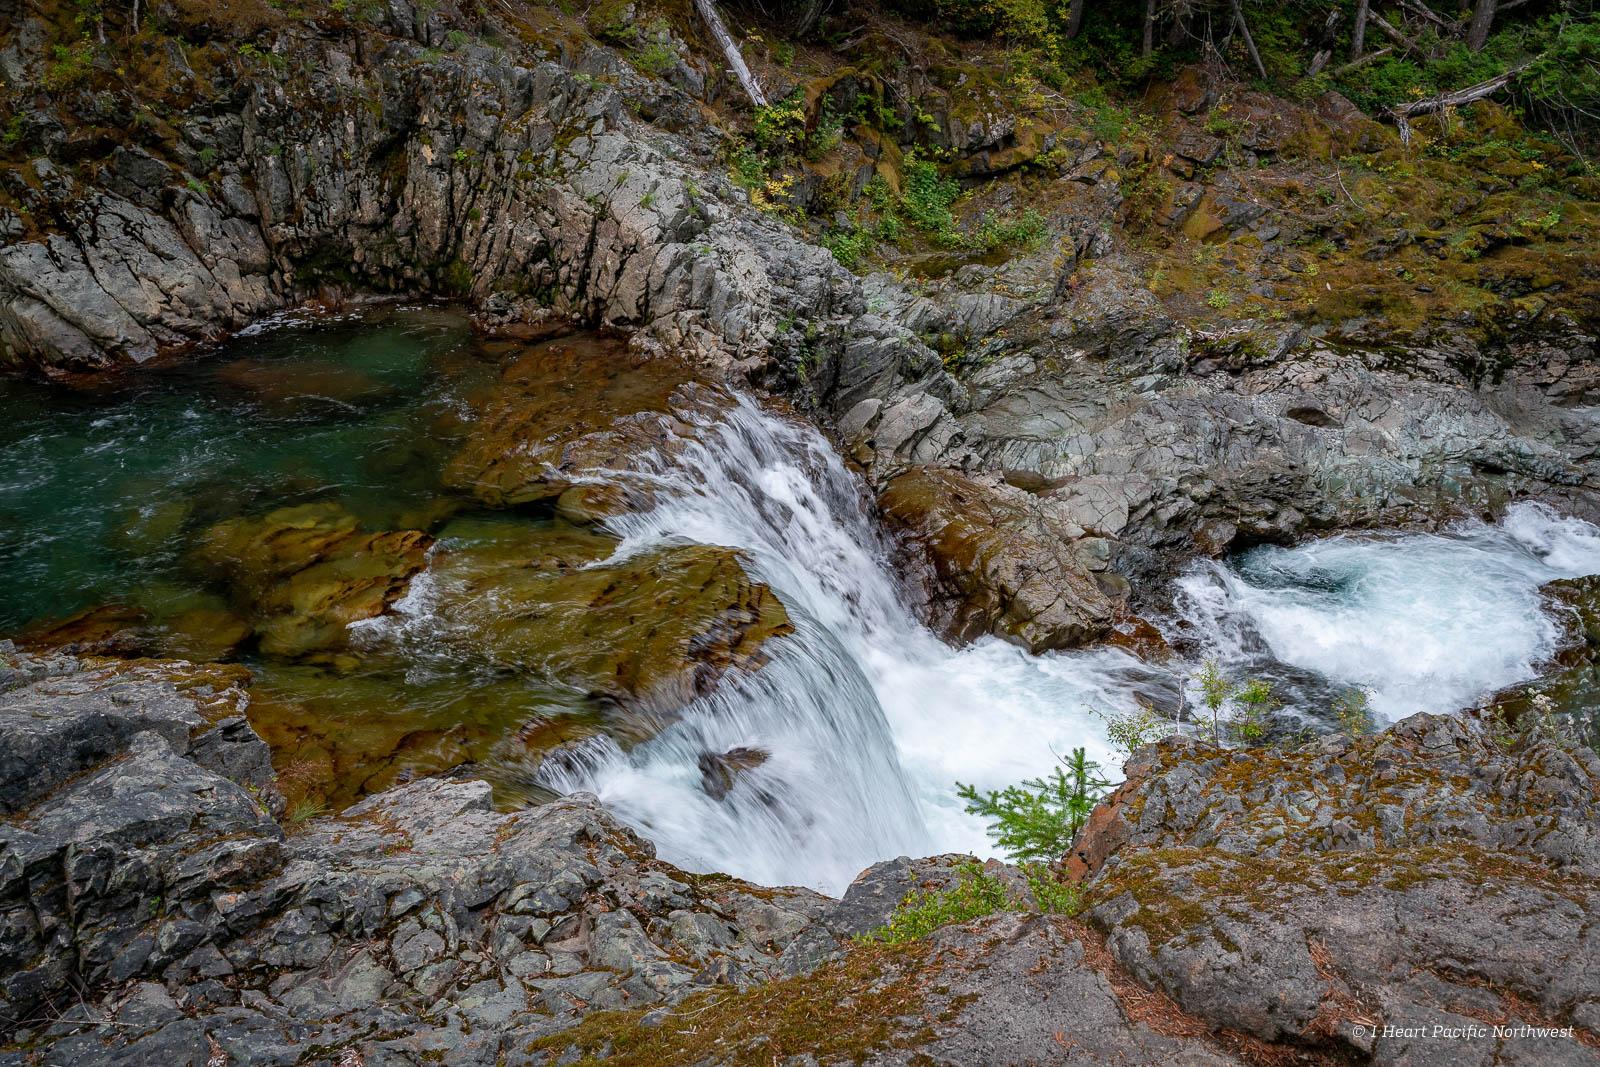 Mount Rainier National Park - Silver Falls hike